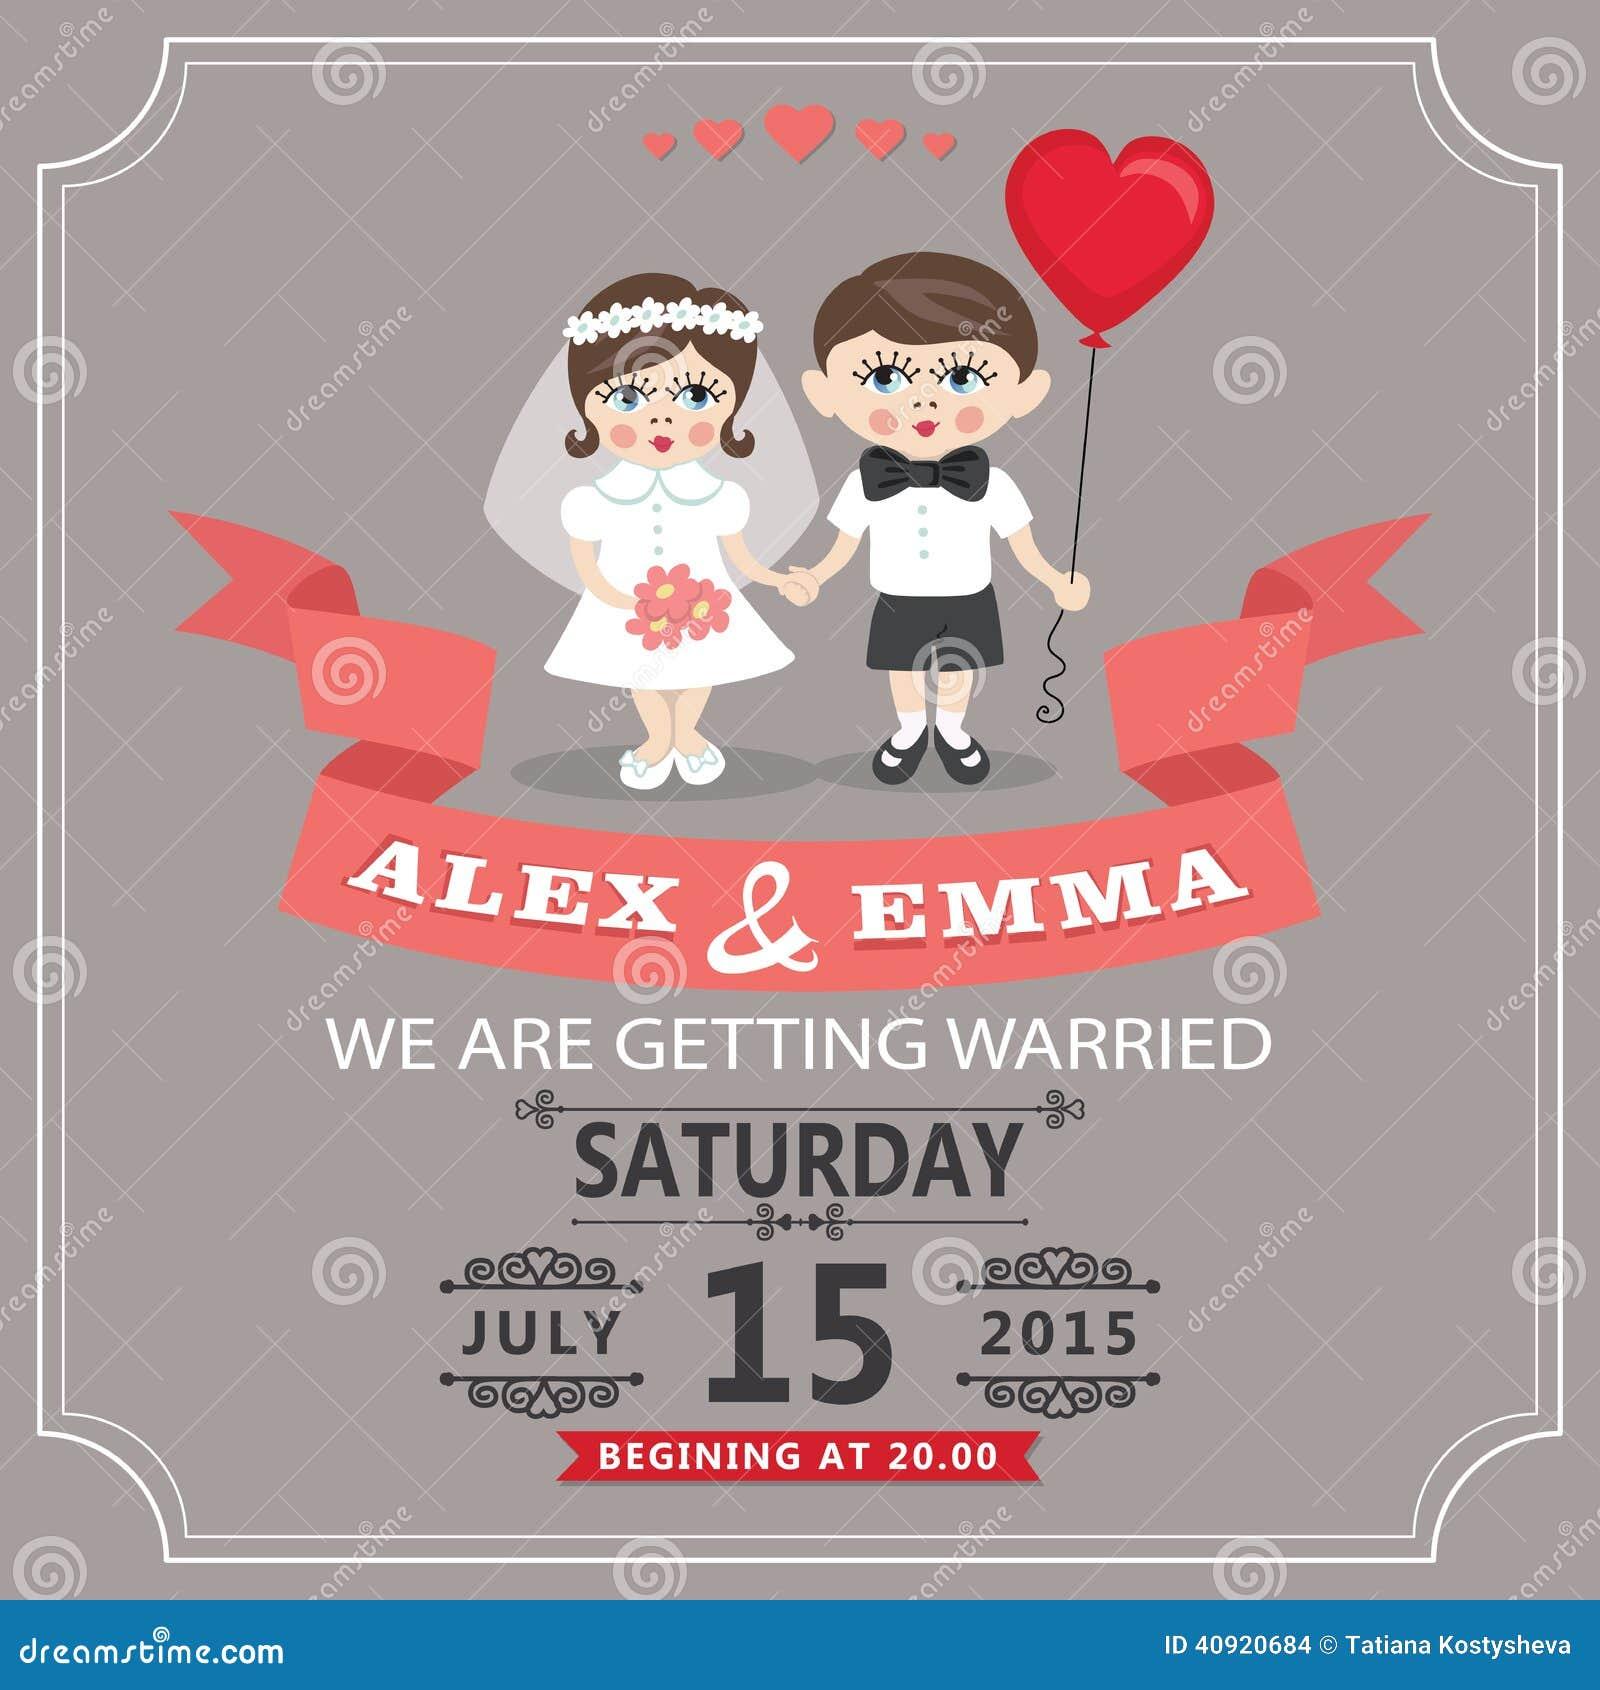 wedding invitation with cartoon european baby bride and